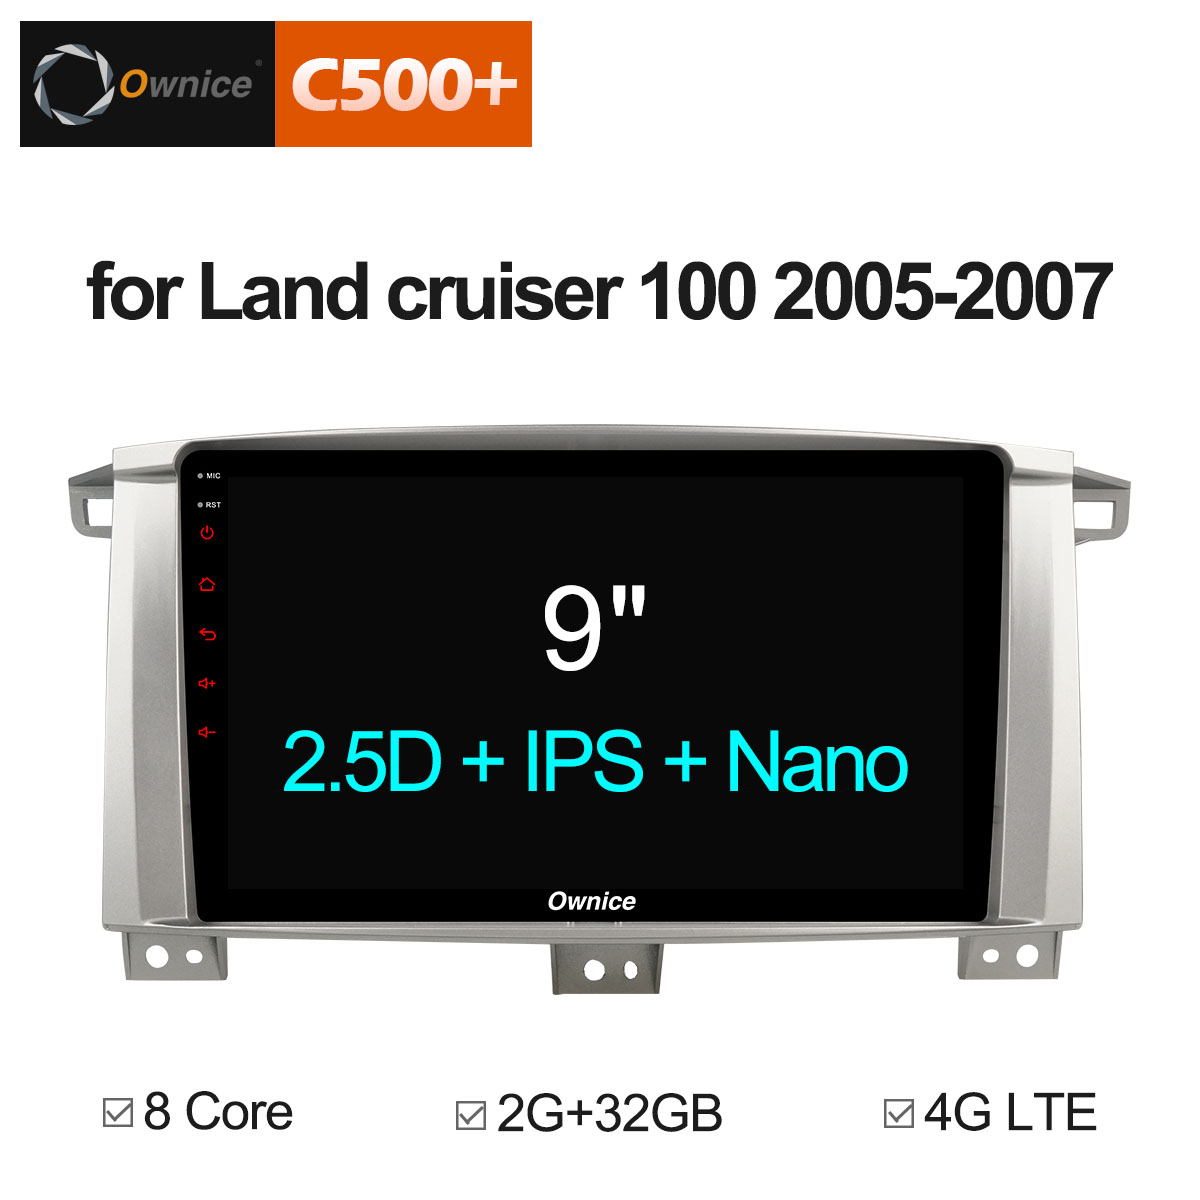 Ownice C500 + G10 Android 8,1 автомобильный DVD стерео для Toyota Land Cruiser 100 LC100/Lexus LX470 2005 2007 Авто Радио RDS Navi 4G